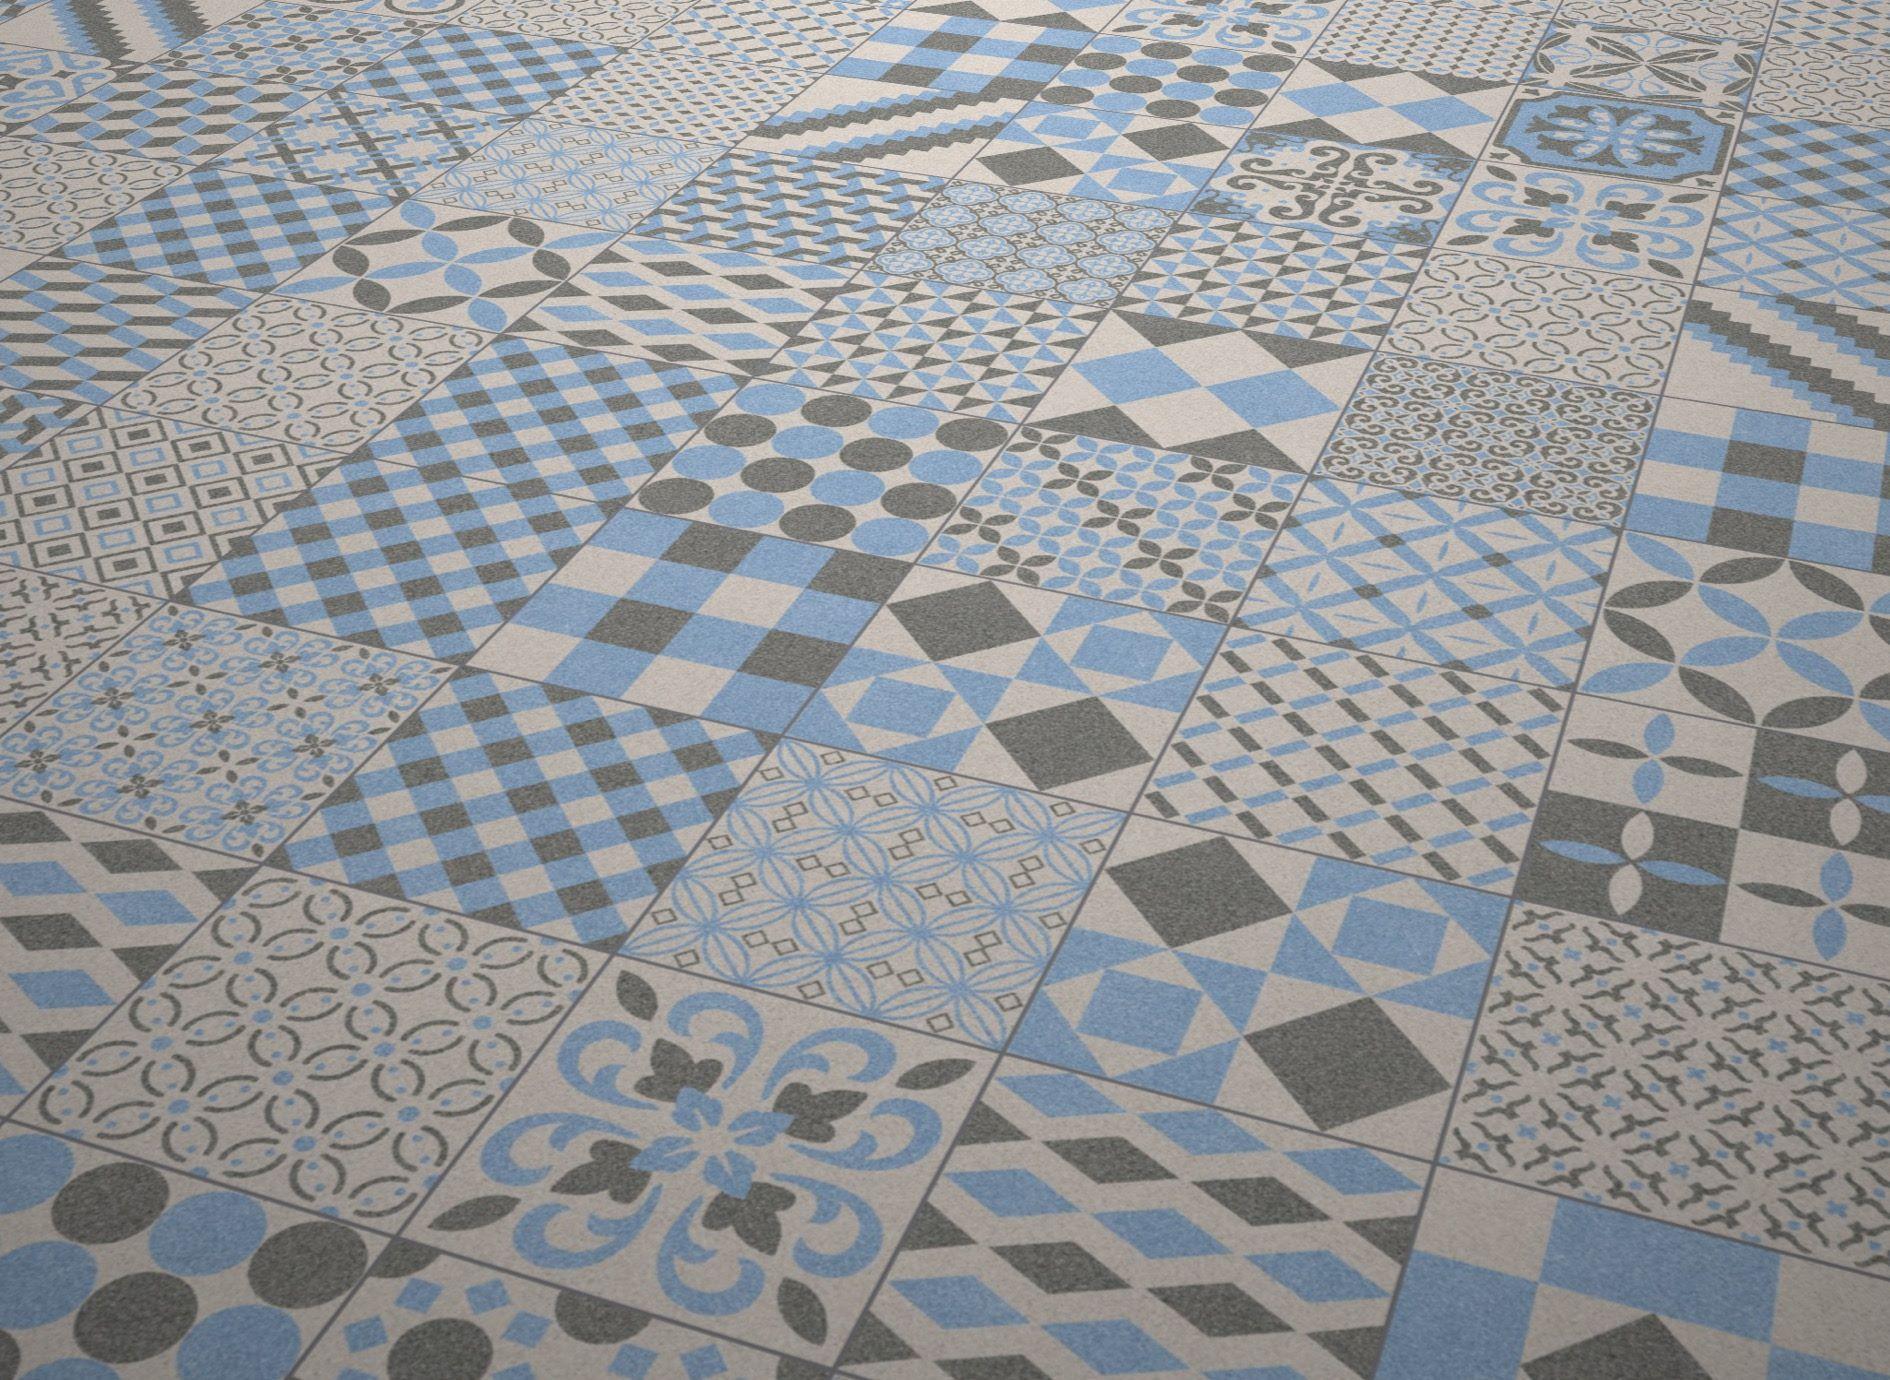 Bathroom tile / floor / porcelain stoneware / patterned - BOREAL ...